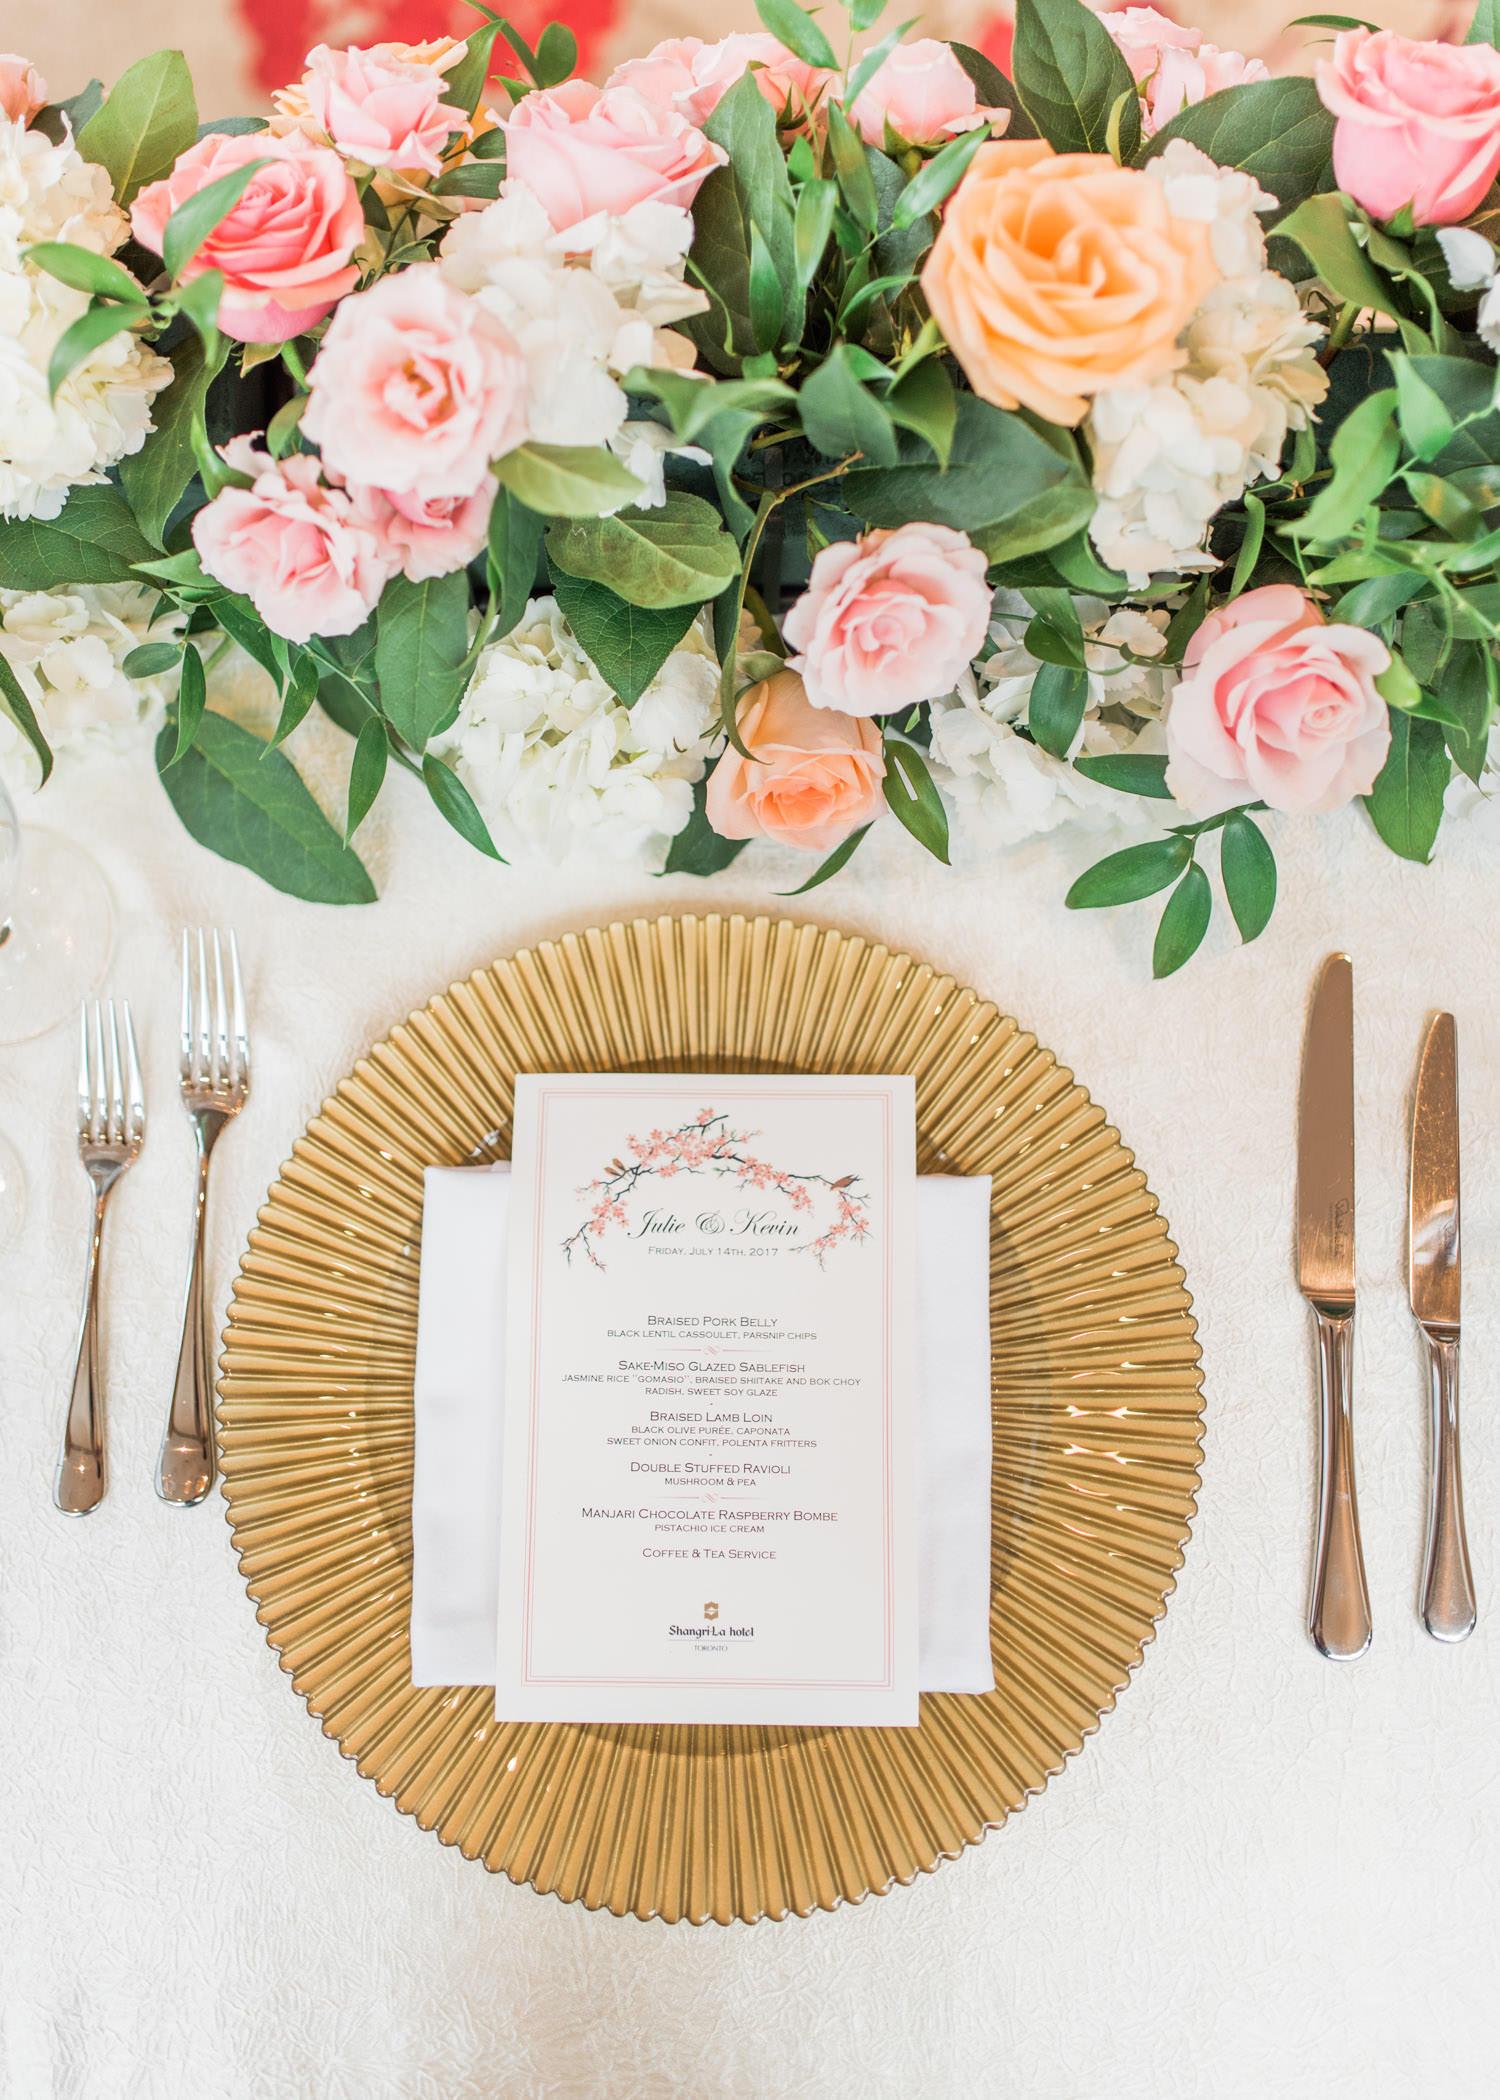 Elegant wedding reception at the Elegant wedding reception at Shangri-La Hotel in Toronto